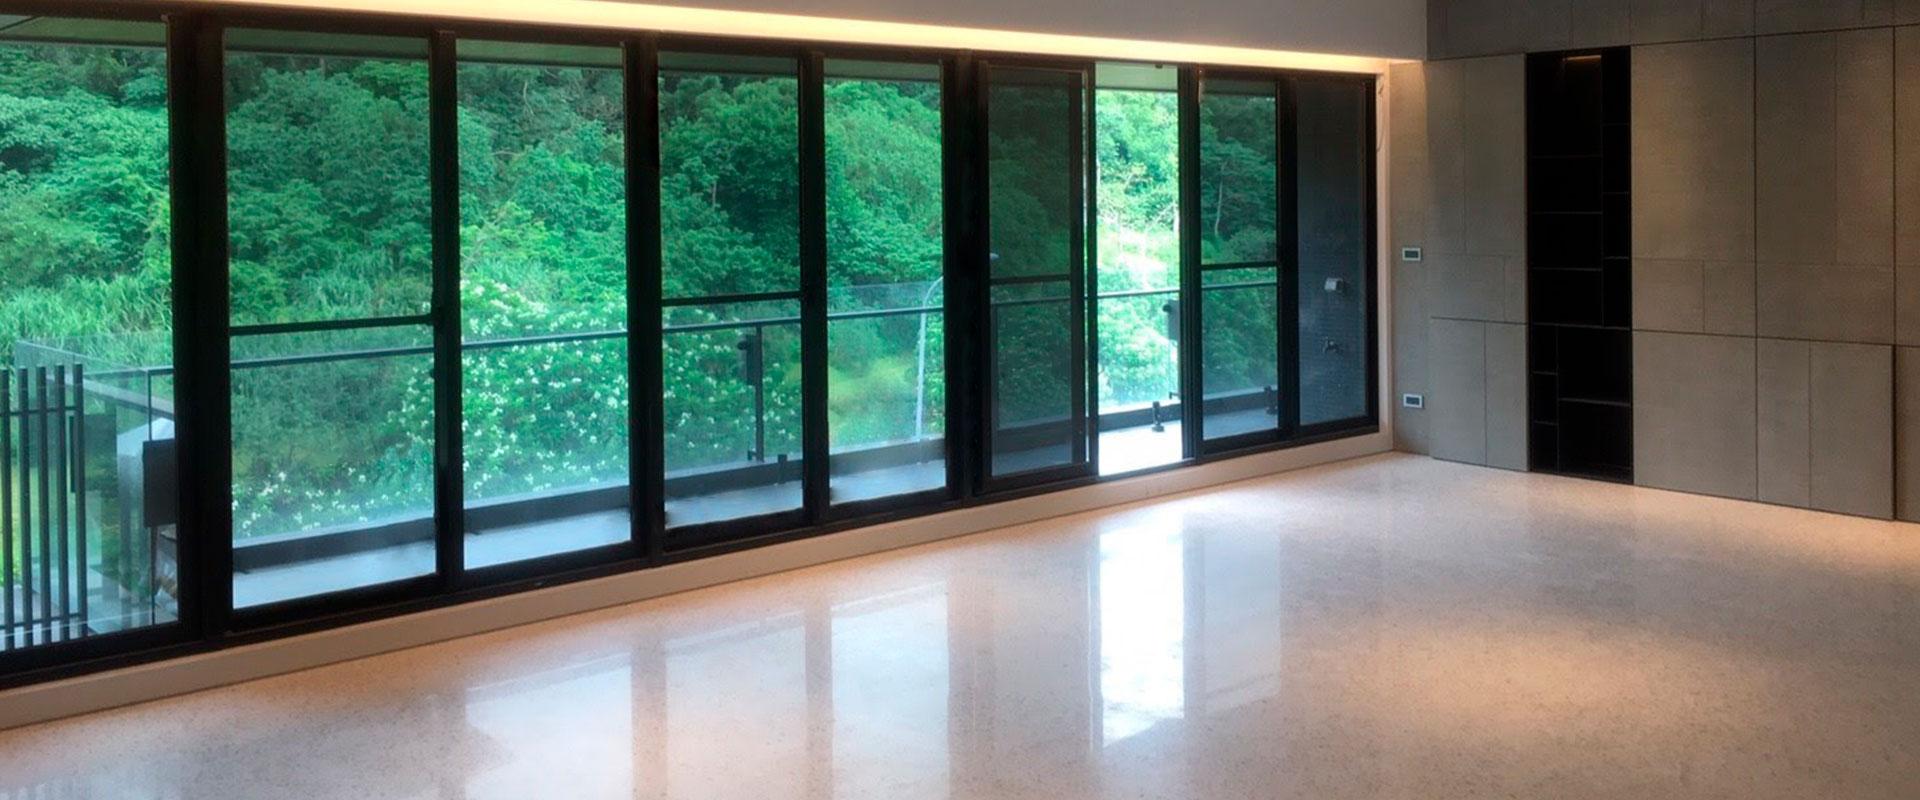 AGGLOTECH-progetto-luxury-apartment-slider-2